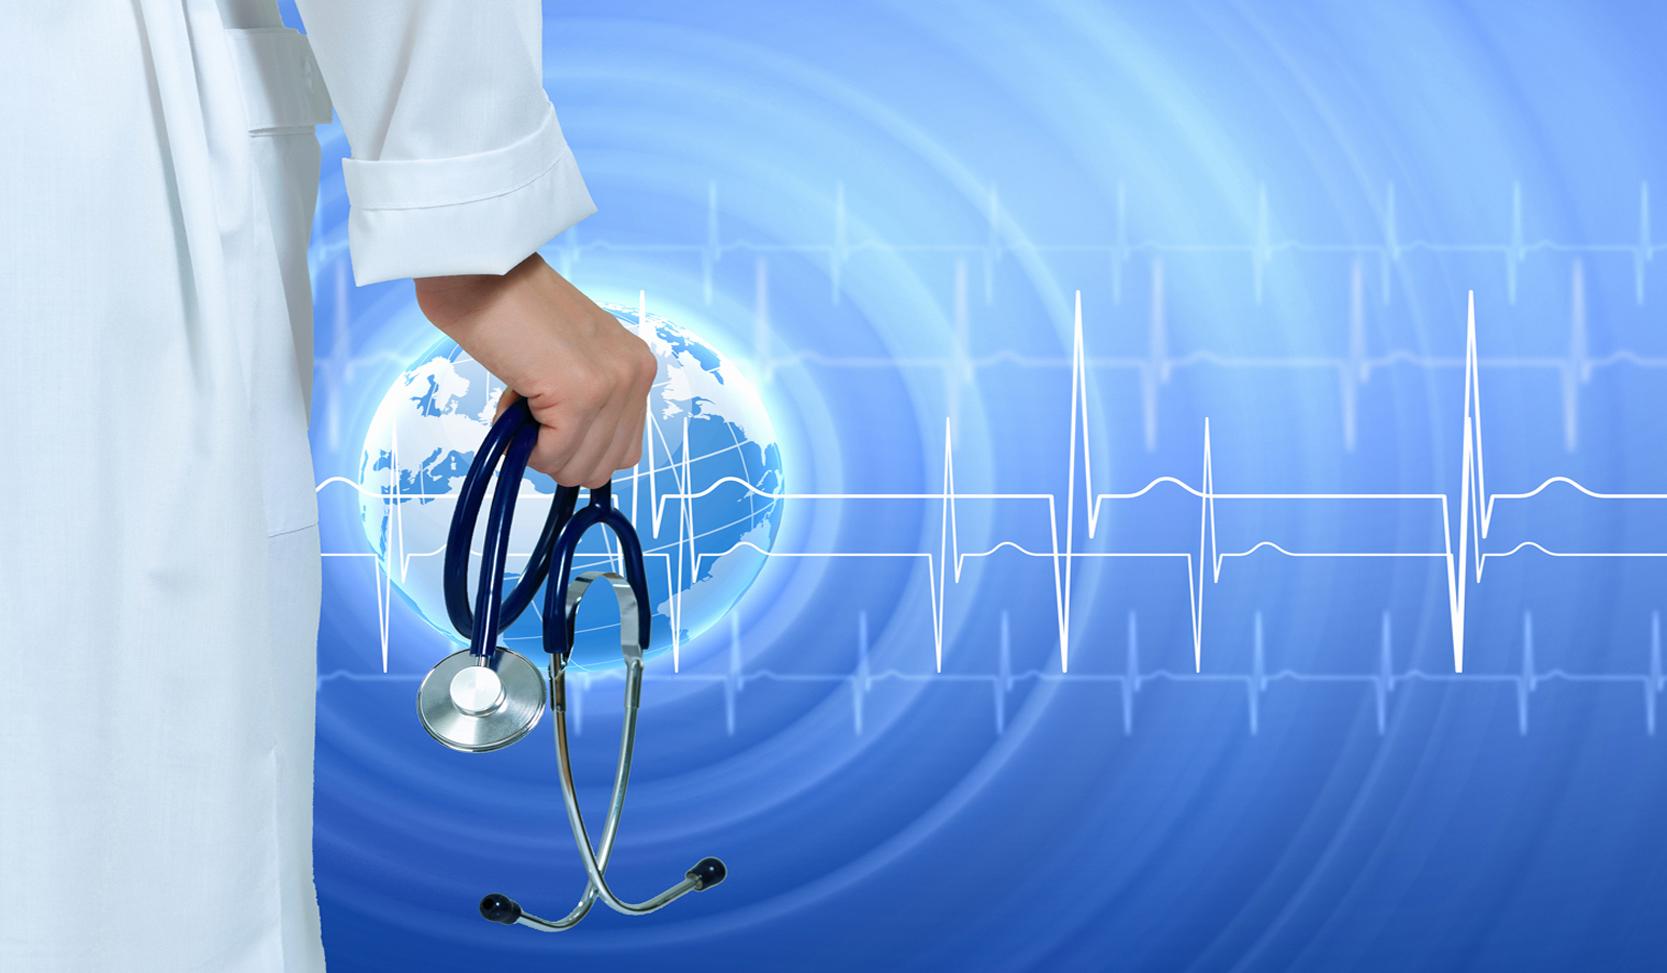 Медицинска техника, апаратура и аксесоари